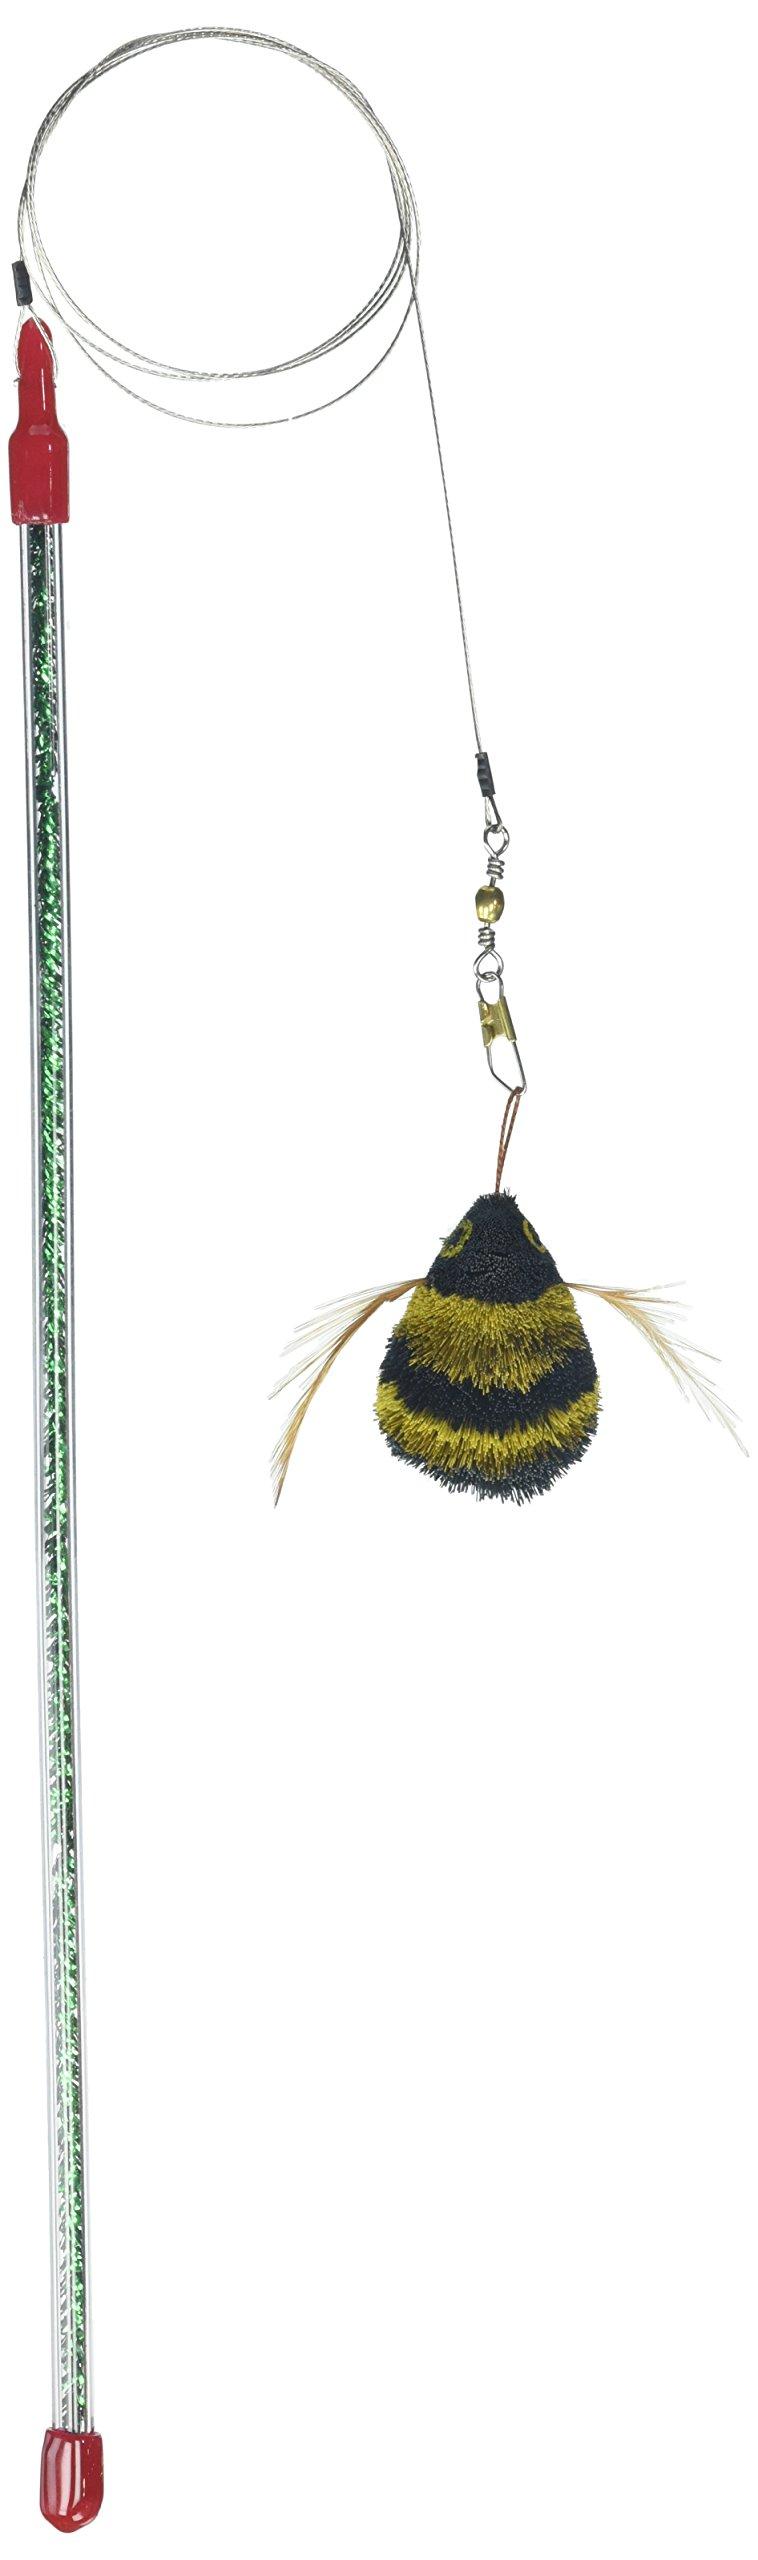 Go Cat Cat Catcher Da Bee Cat Toy, Handmade in the USA (1 Bee)